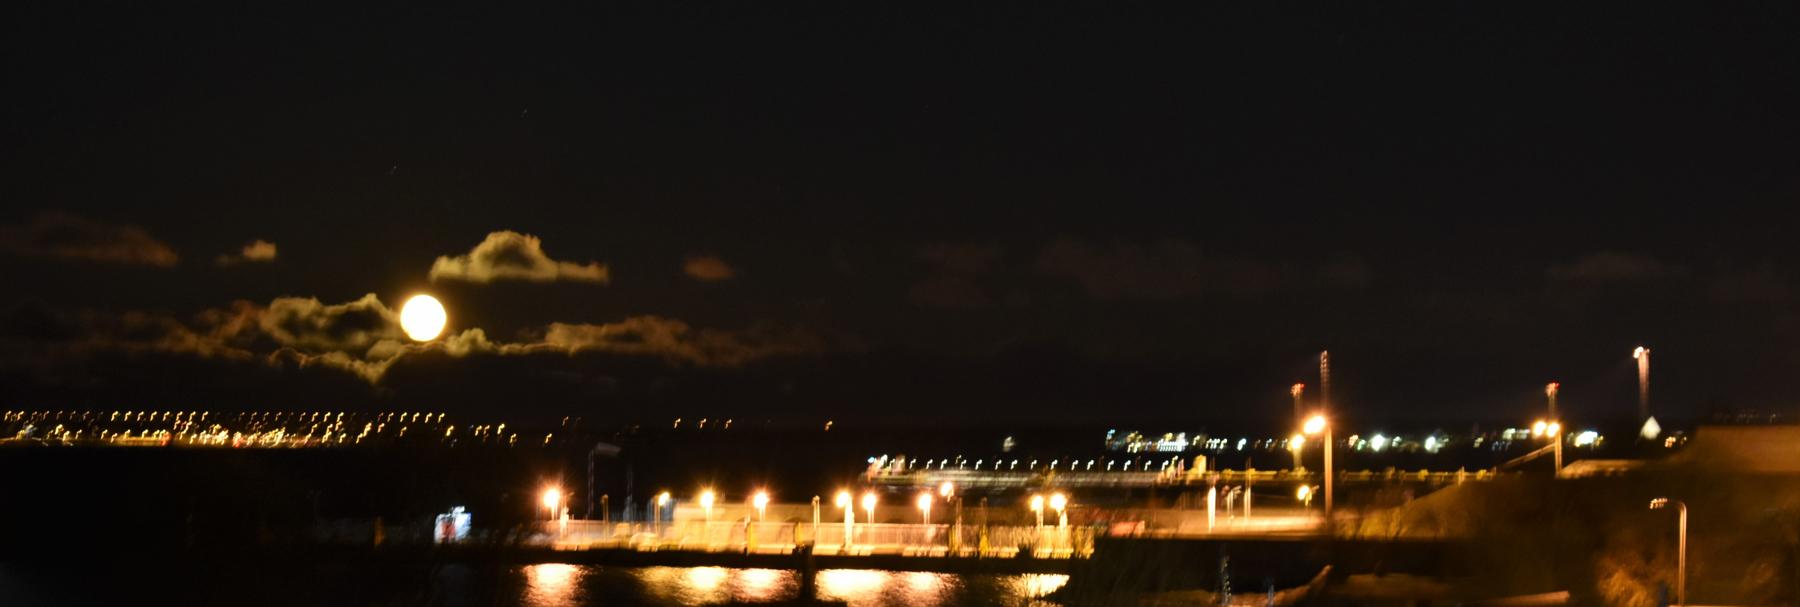 blurry moonlight